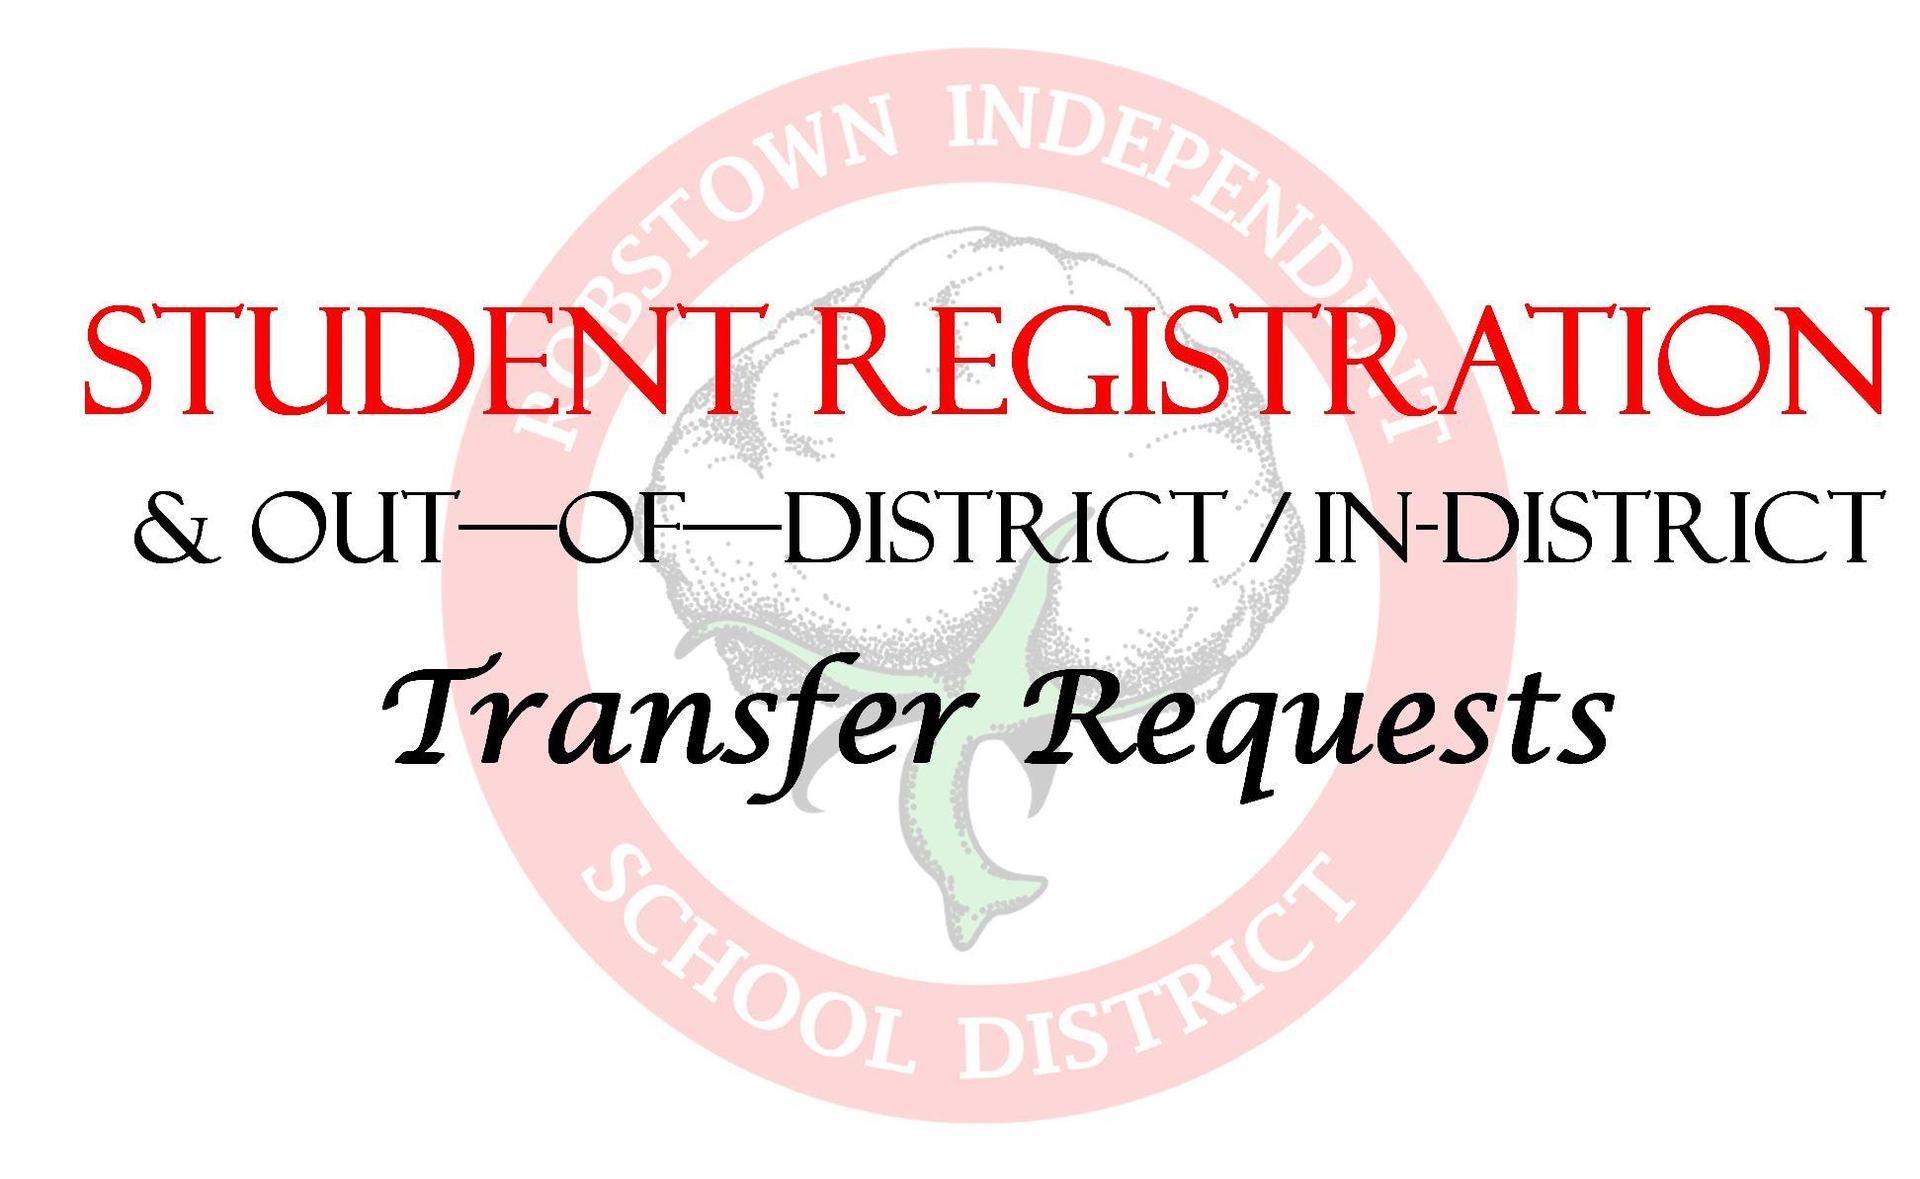 Transfer Request